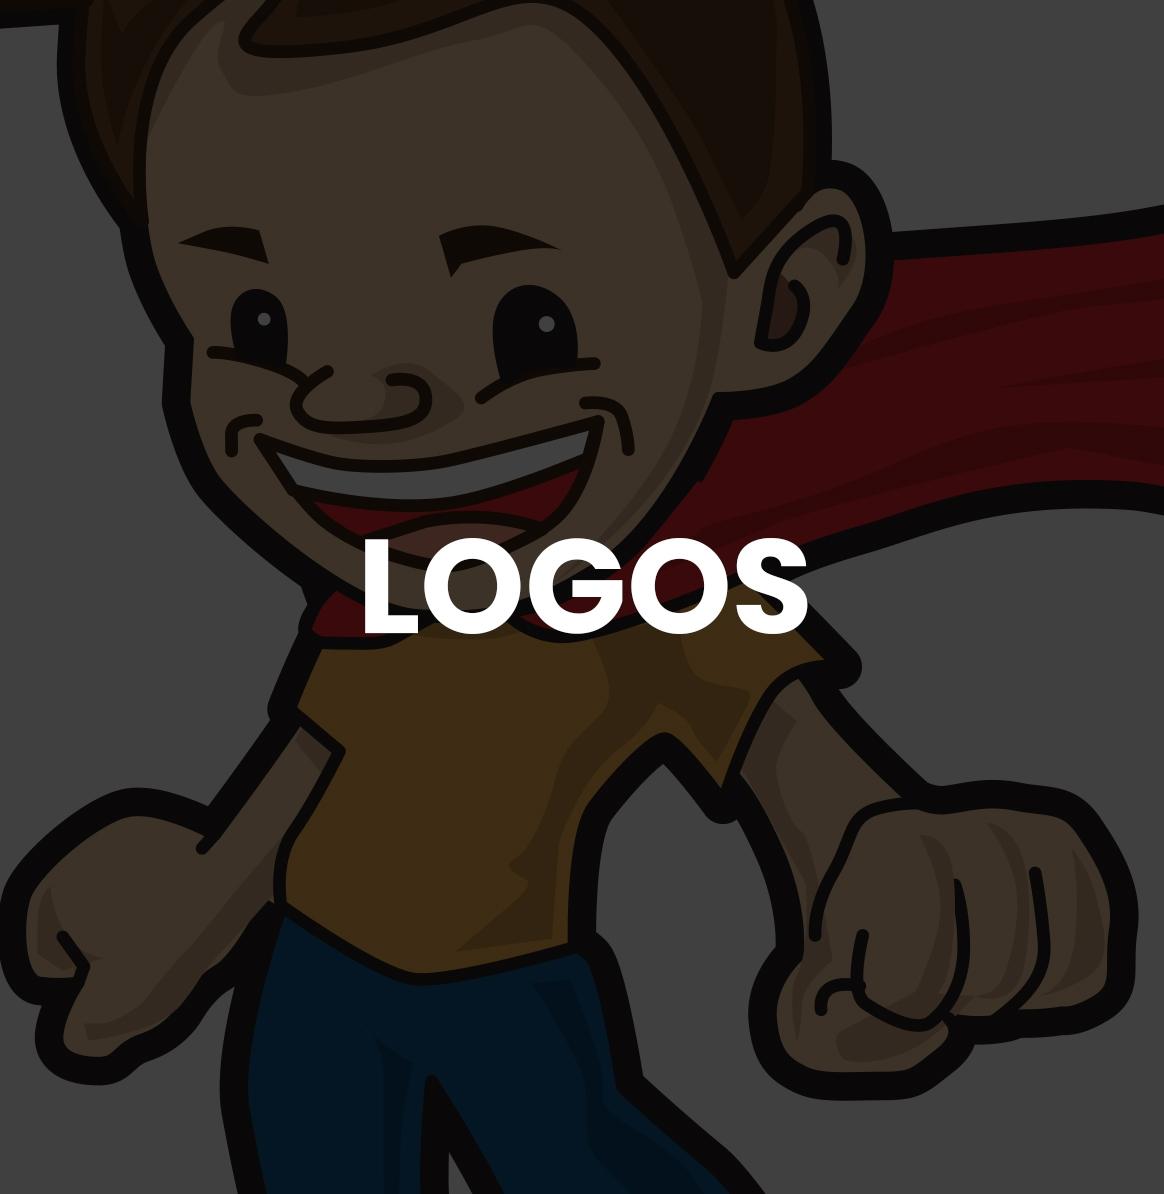 CategoryMasters_LOGOS